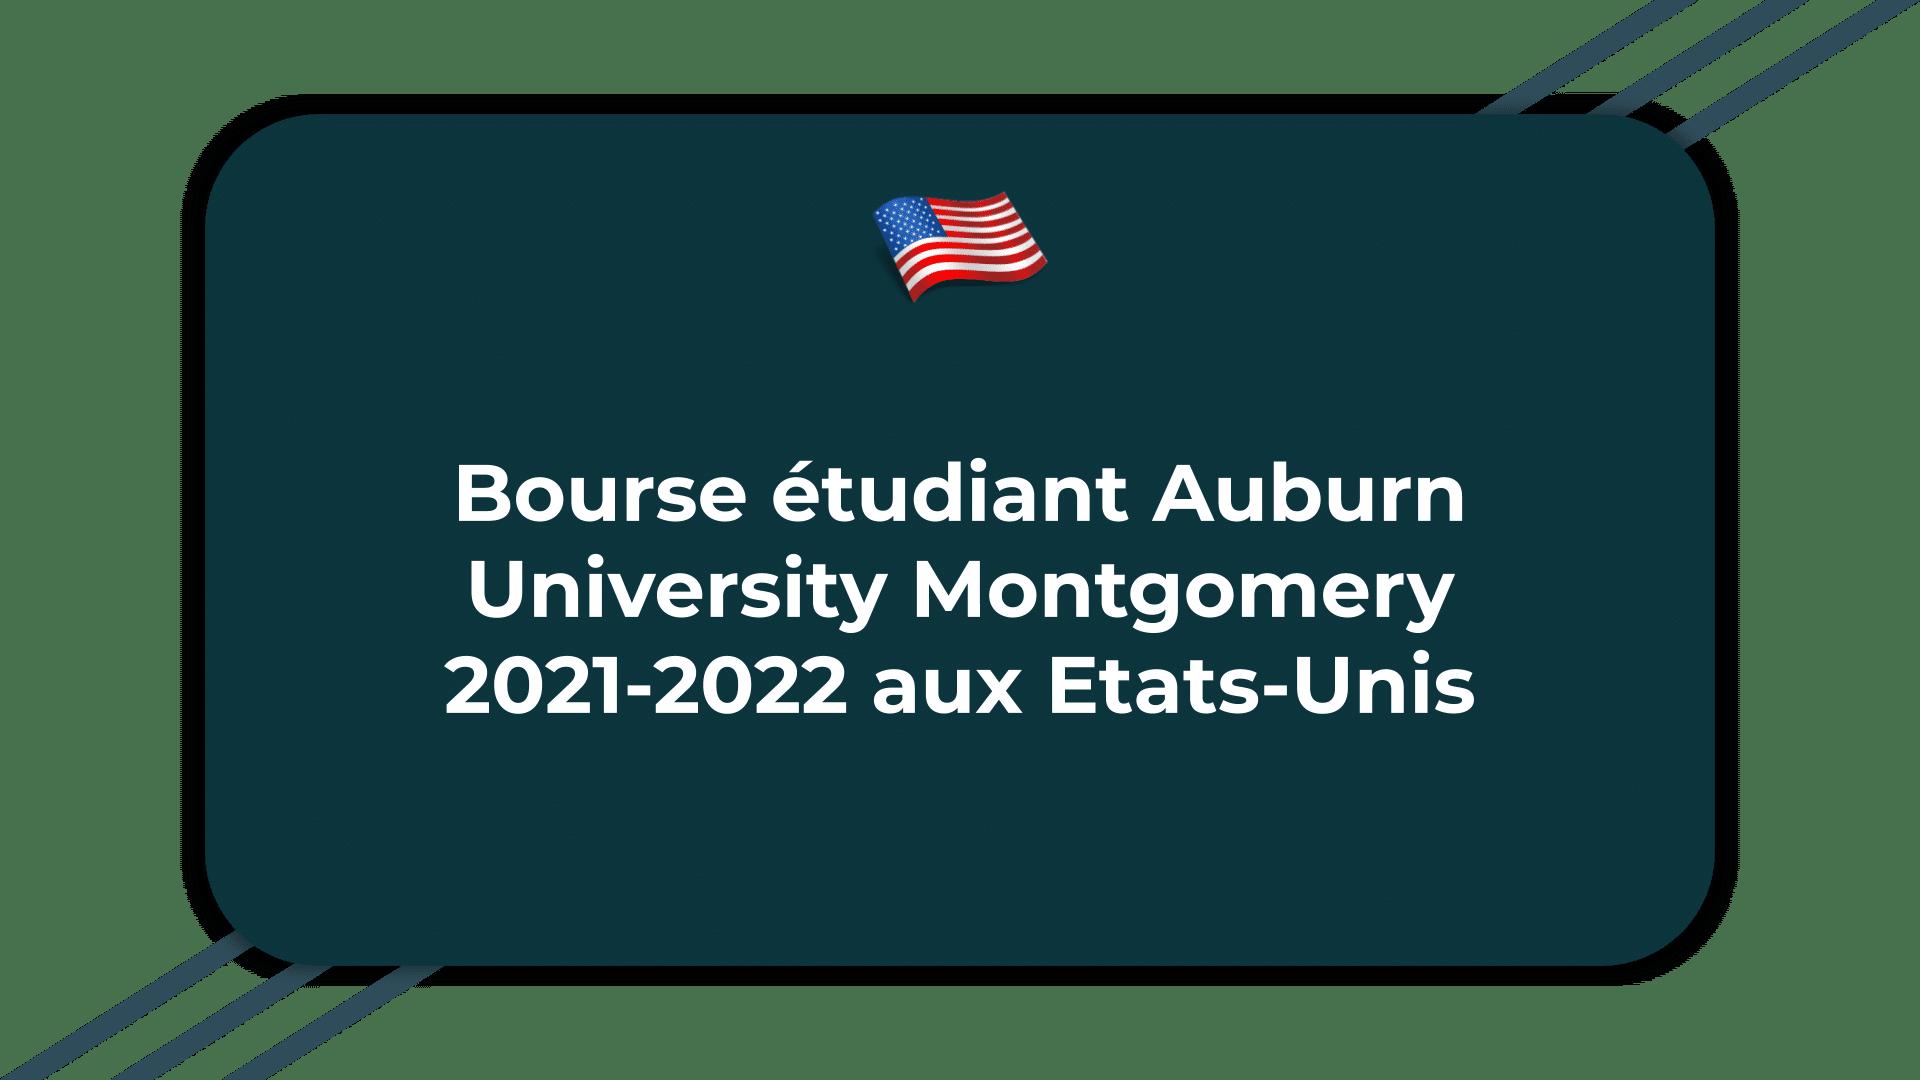 Bourse étudiant Auburn University Montgomery